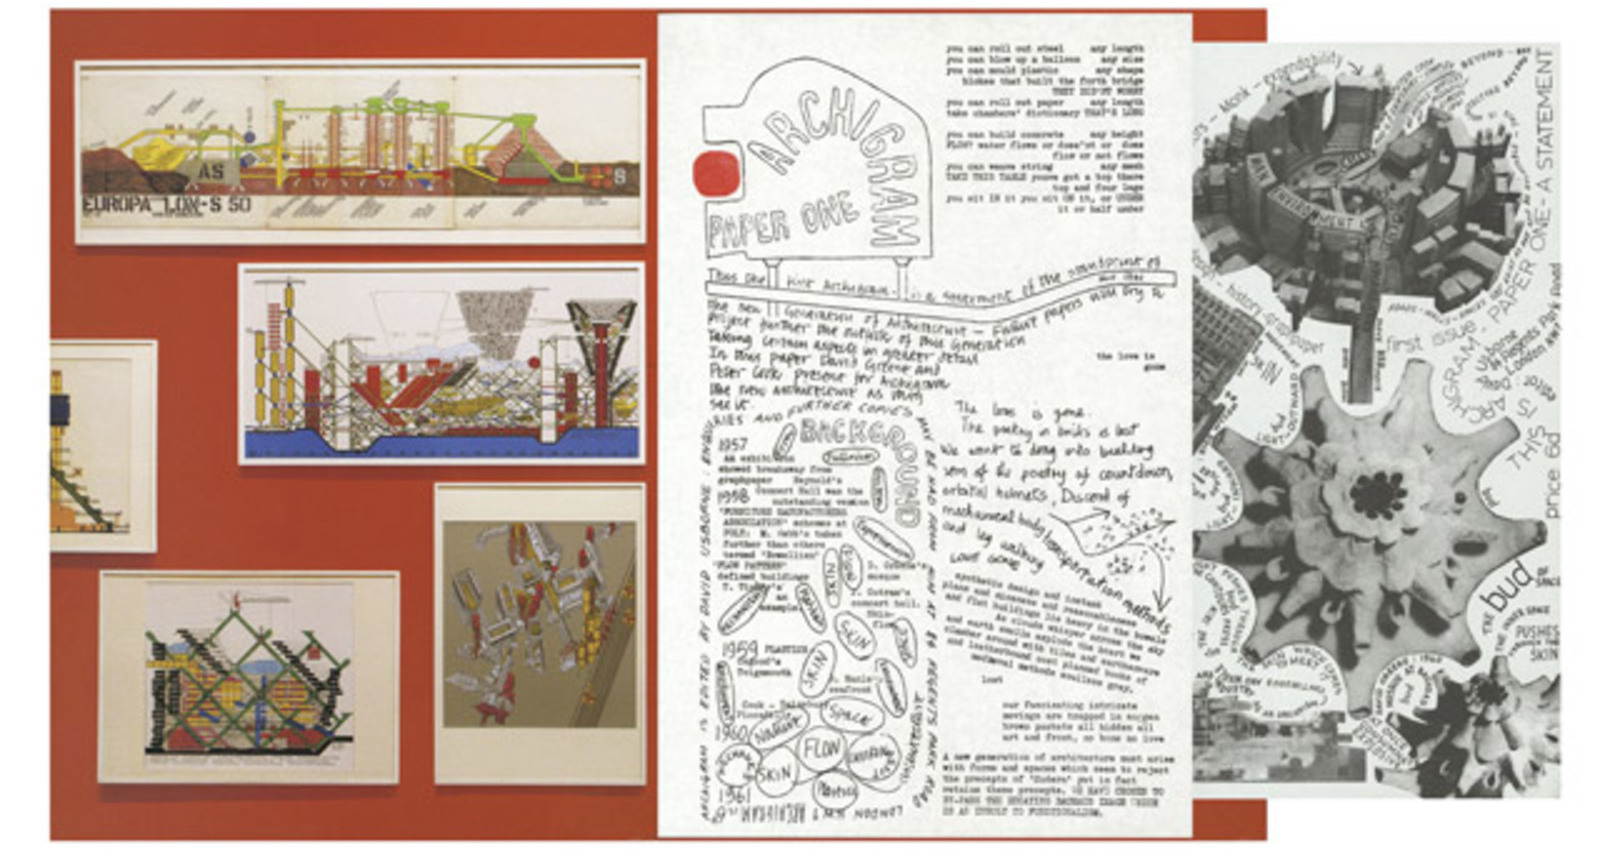 ARCHIGRAM: experimental architecture 1961-1974